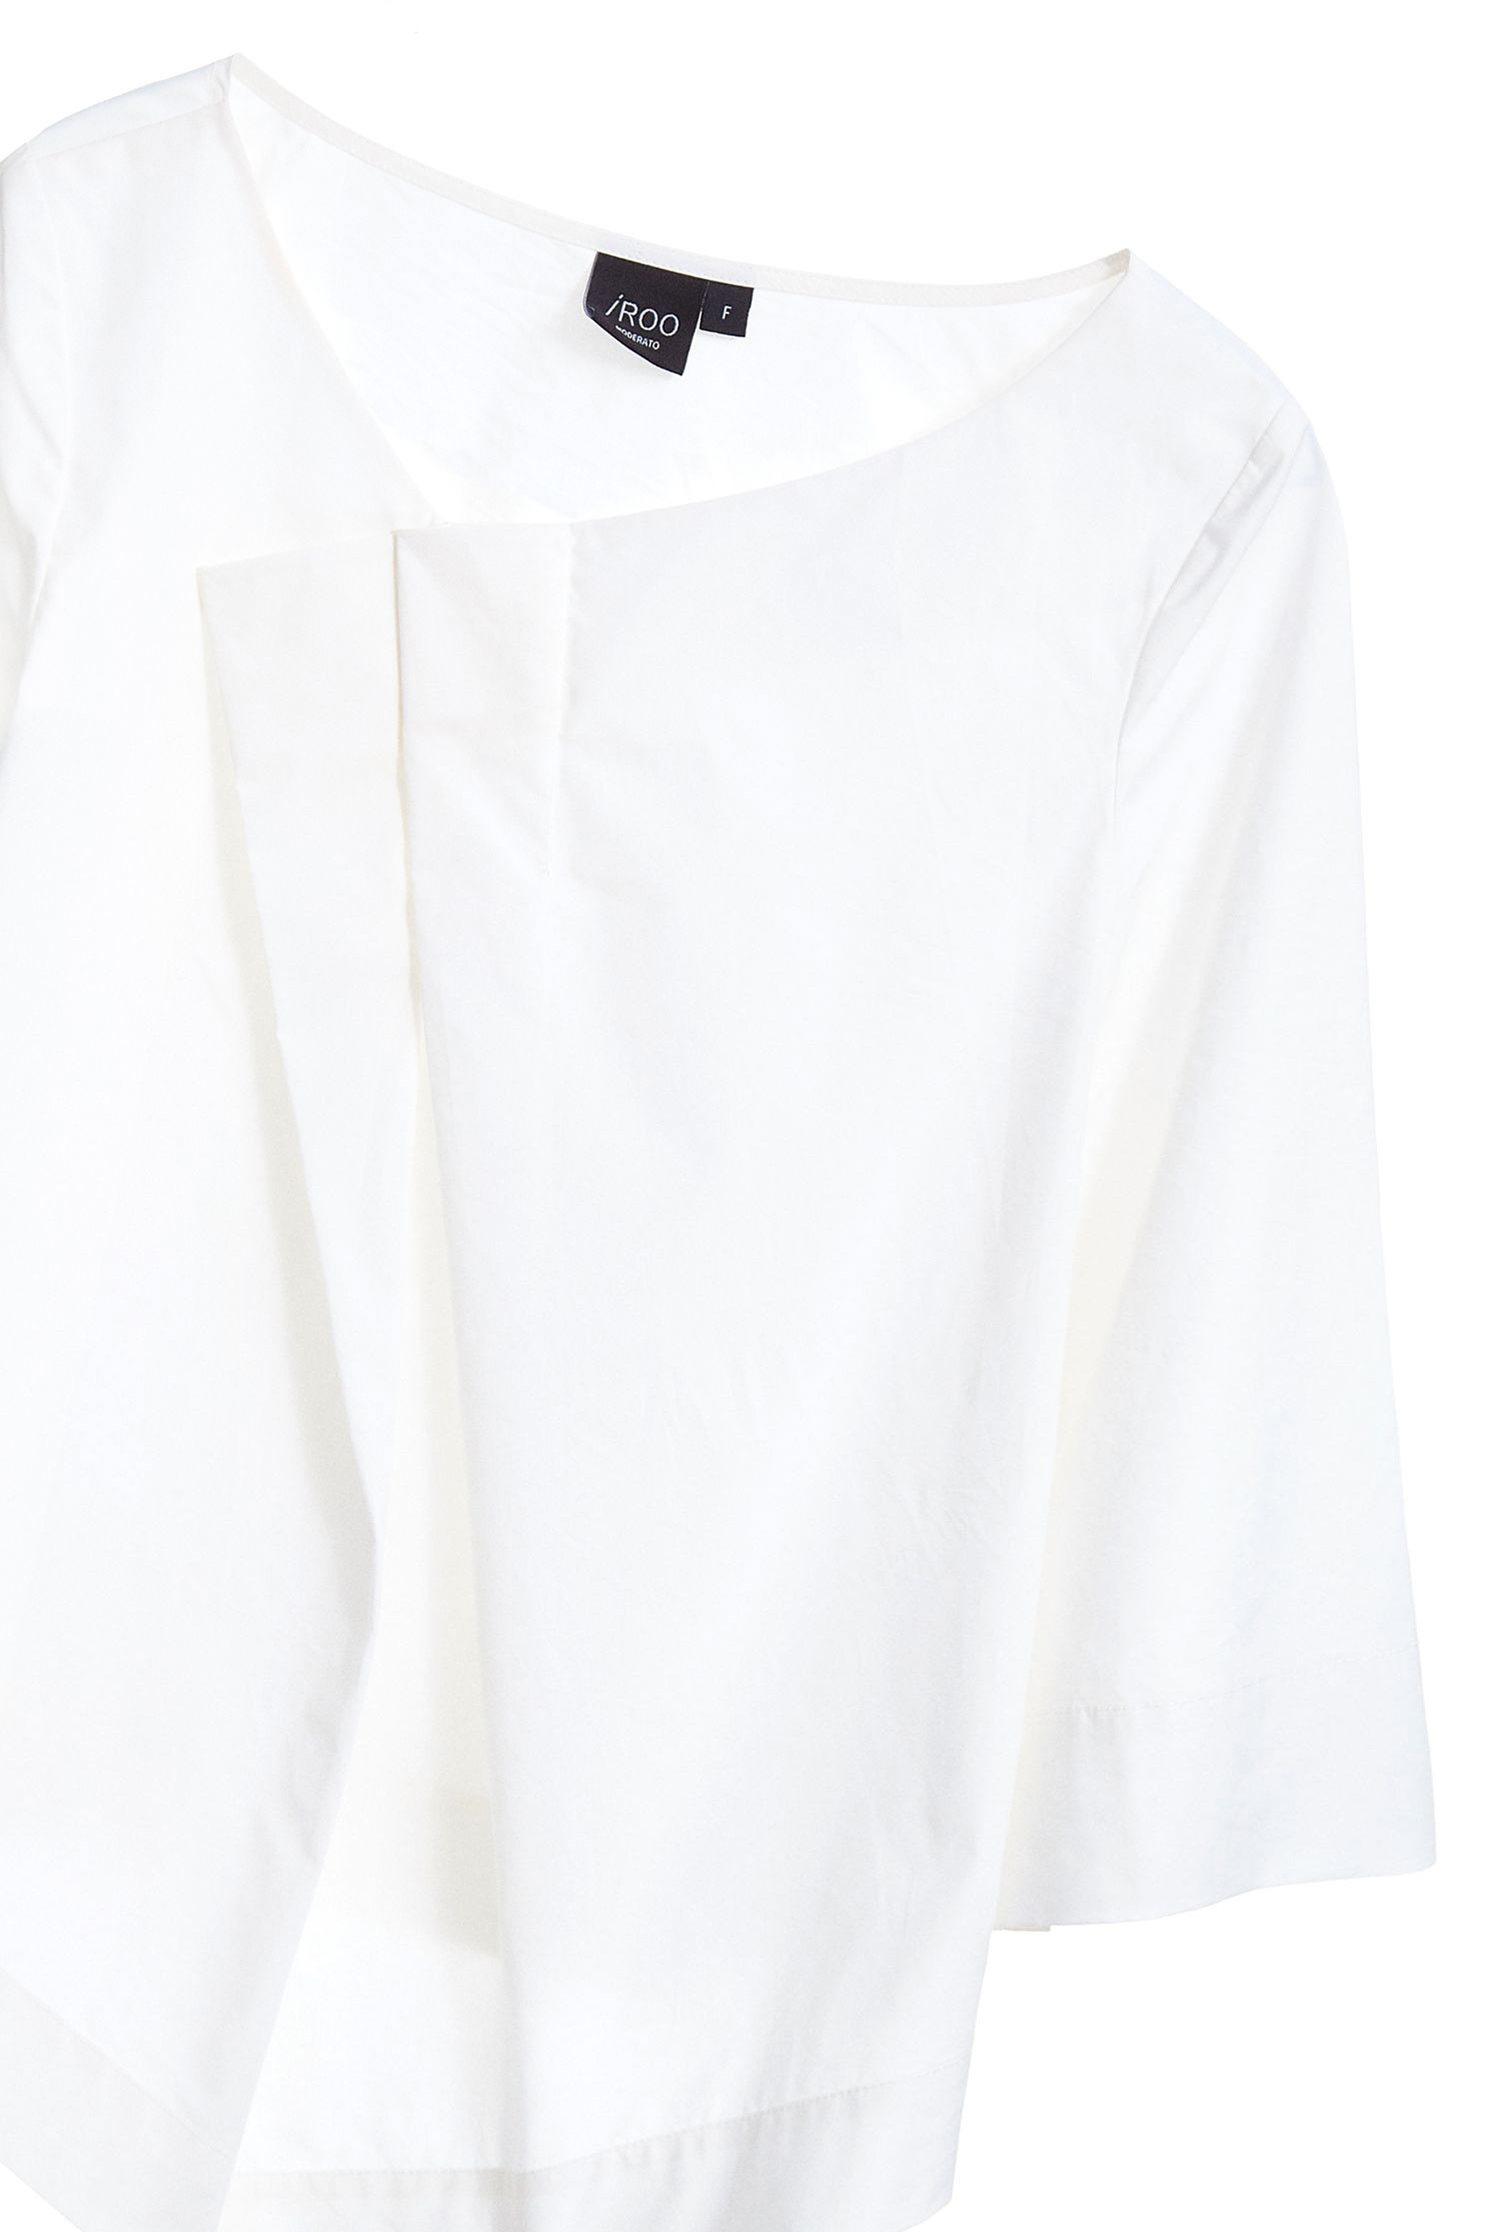 Plain classic top,top,whitetop,cotton,longsleevetop